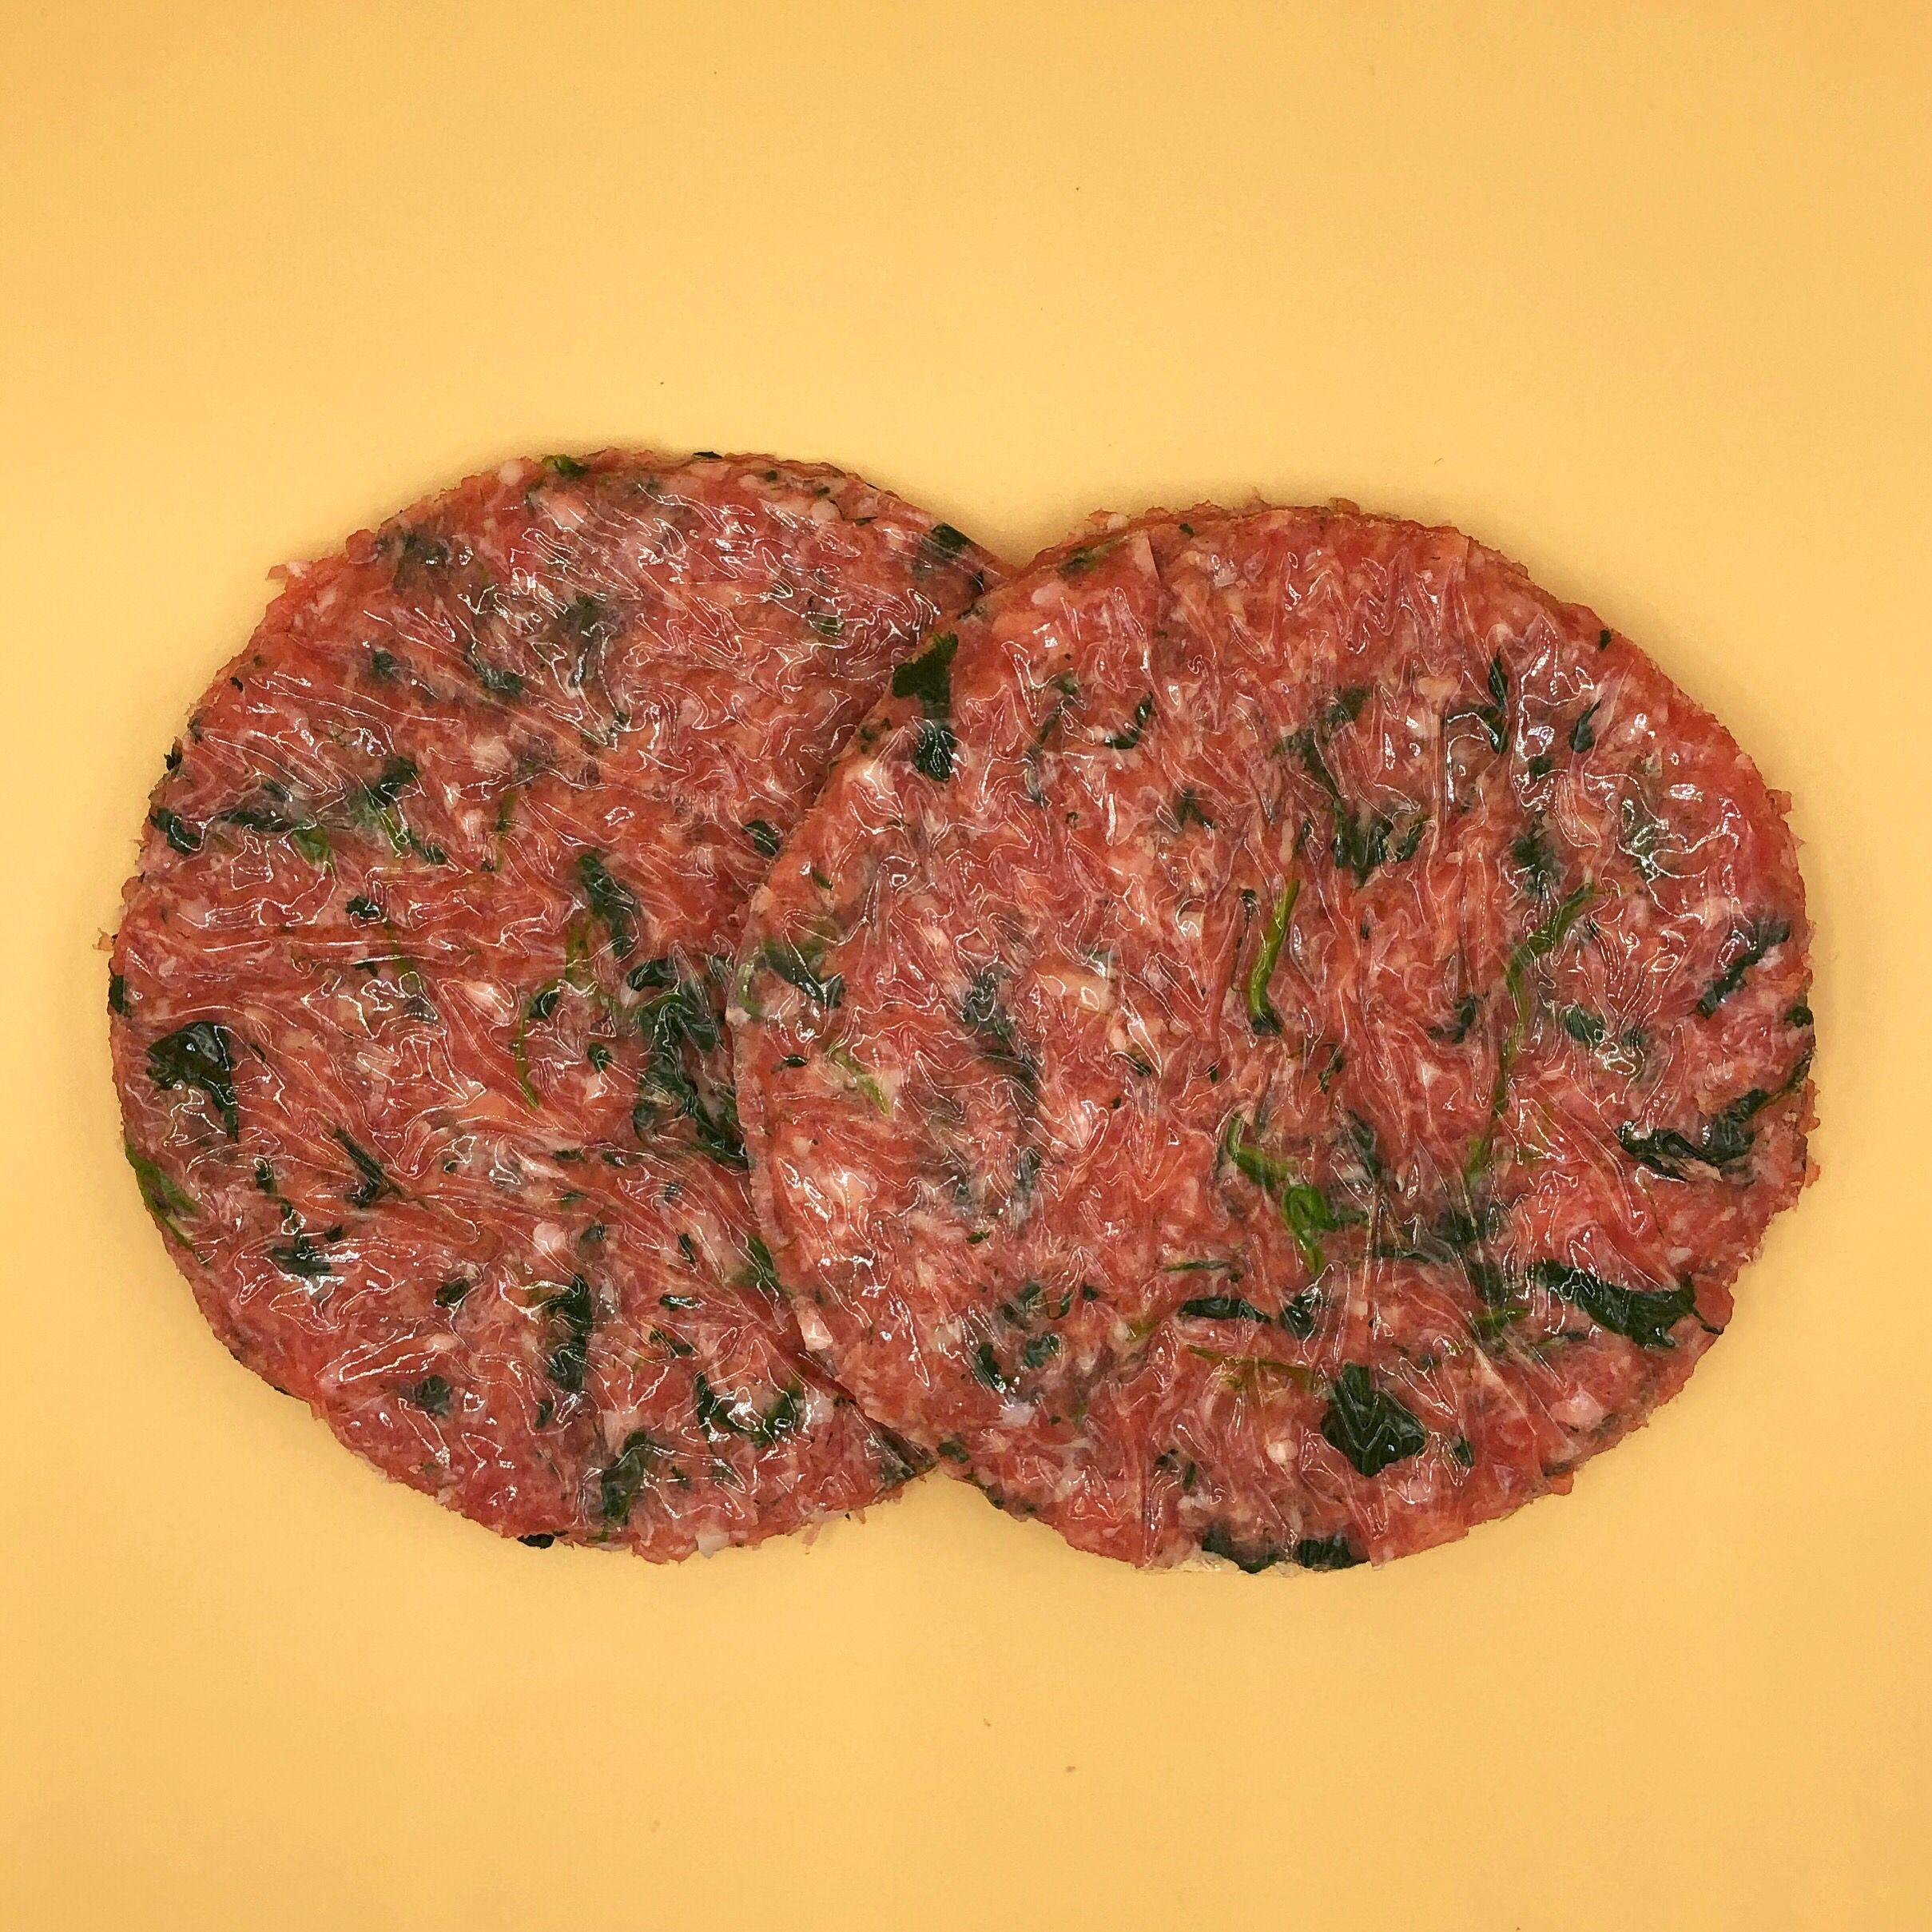 Preferenza Hamburger con spinaci 🥗🍔💪🏻 | Hamburger con spinaci, Spinaci ID48